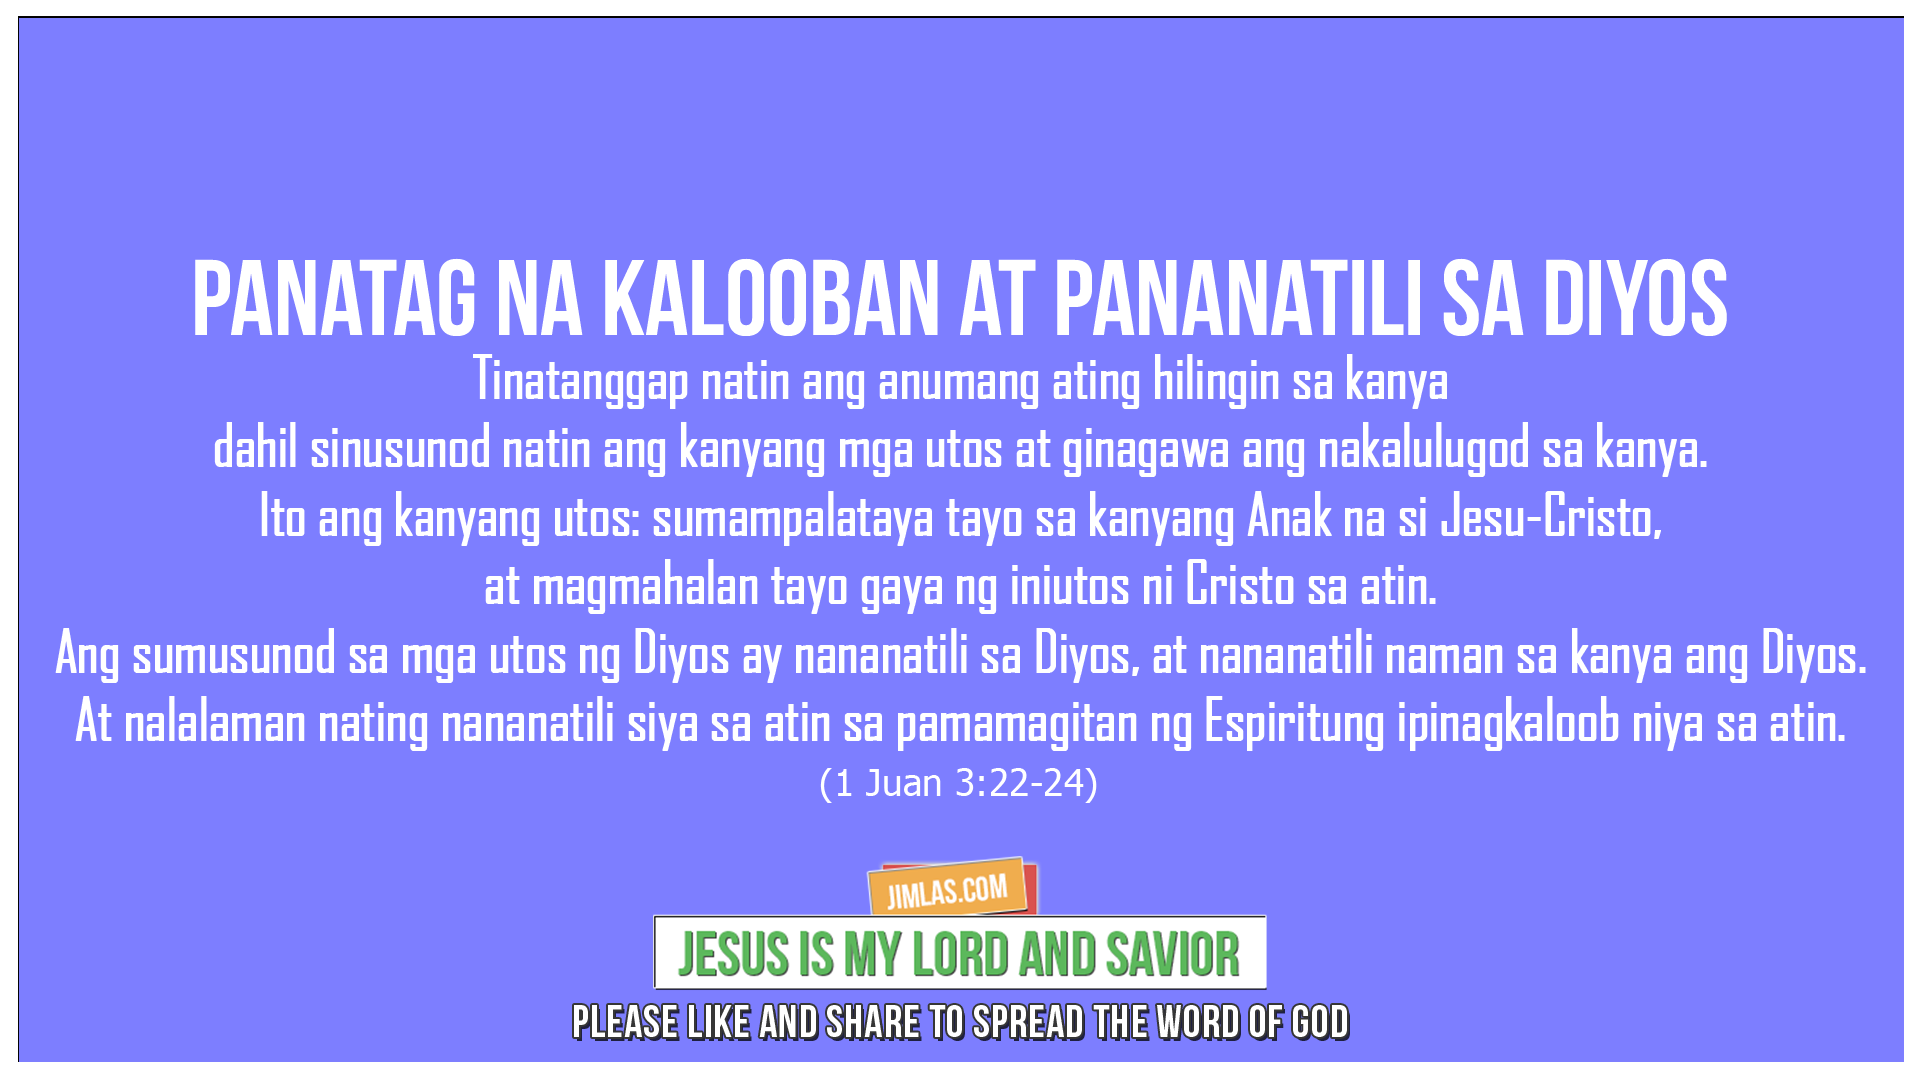 1 Juan 3:22-24, 1 Juan 3:22-24